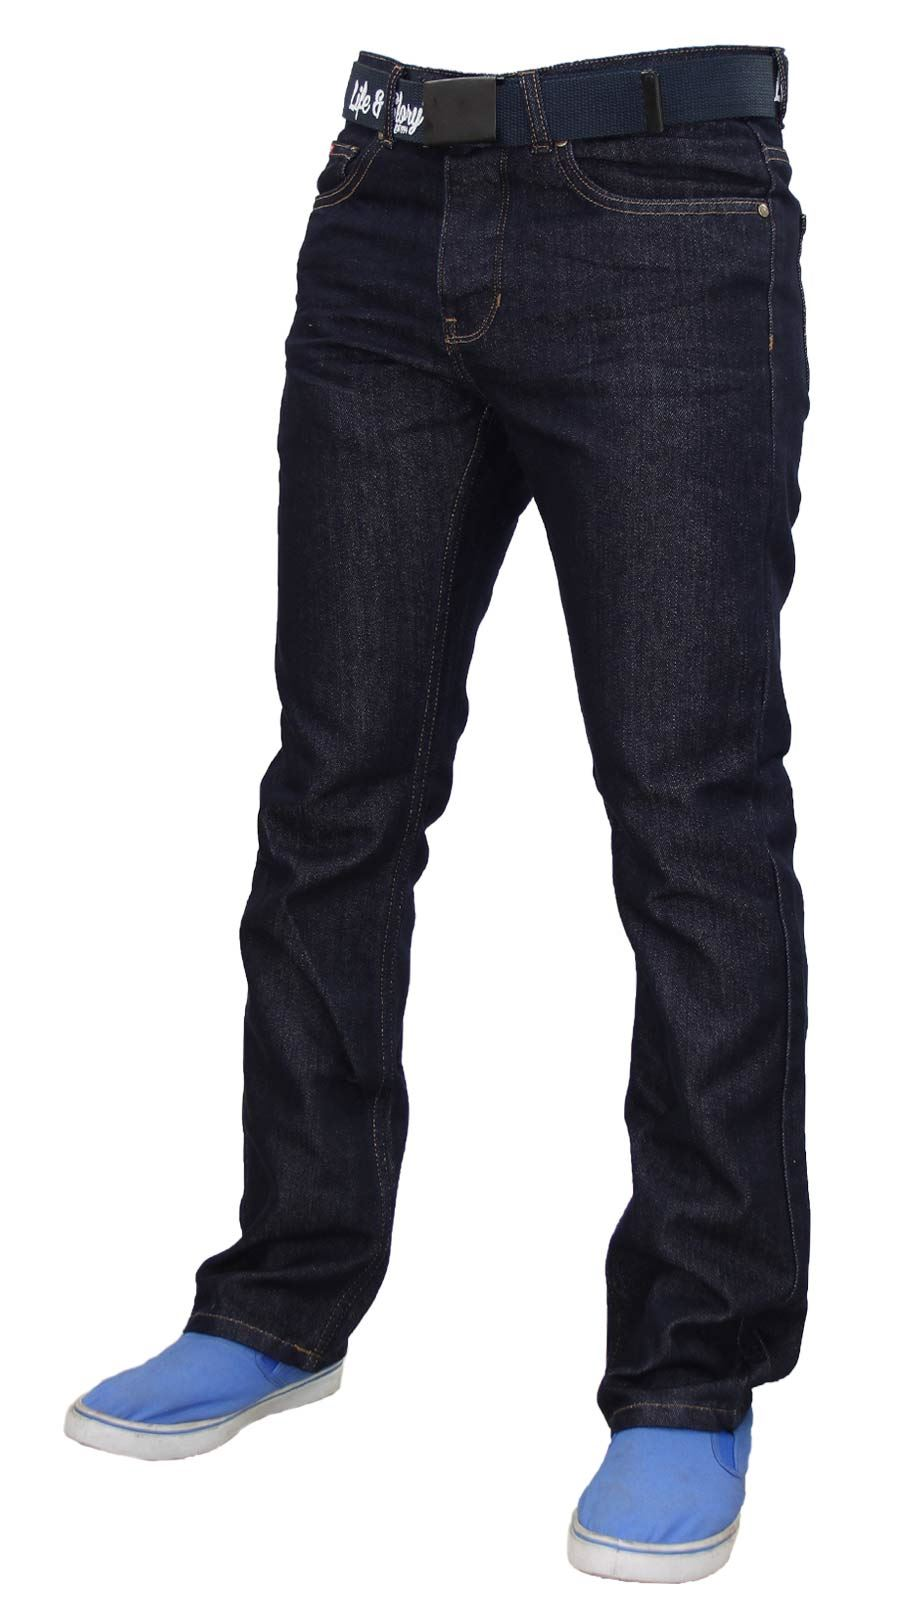 Mens-Regular-Fit-Jeans-Straight-Leg-Denim-Pants-Casual-Trousers-With-Free-Belt thumbnail 14